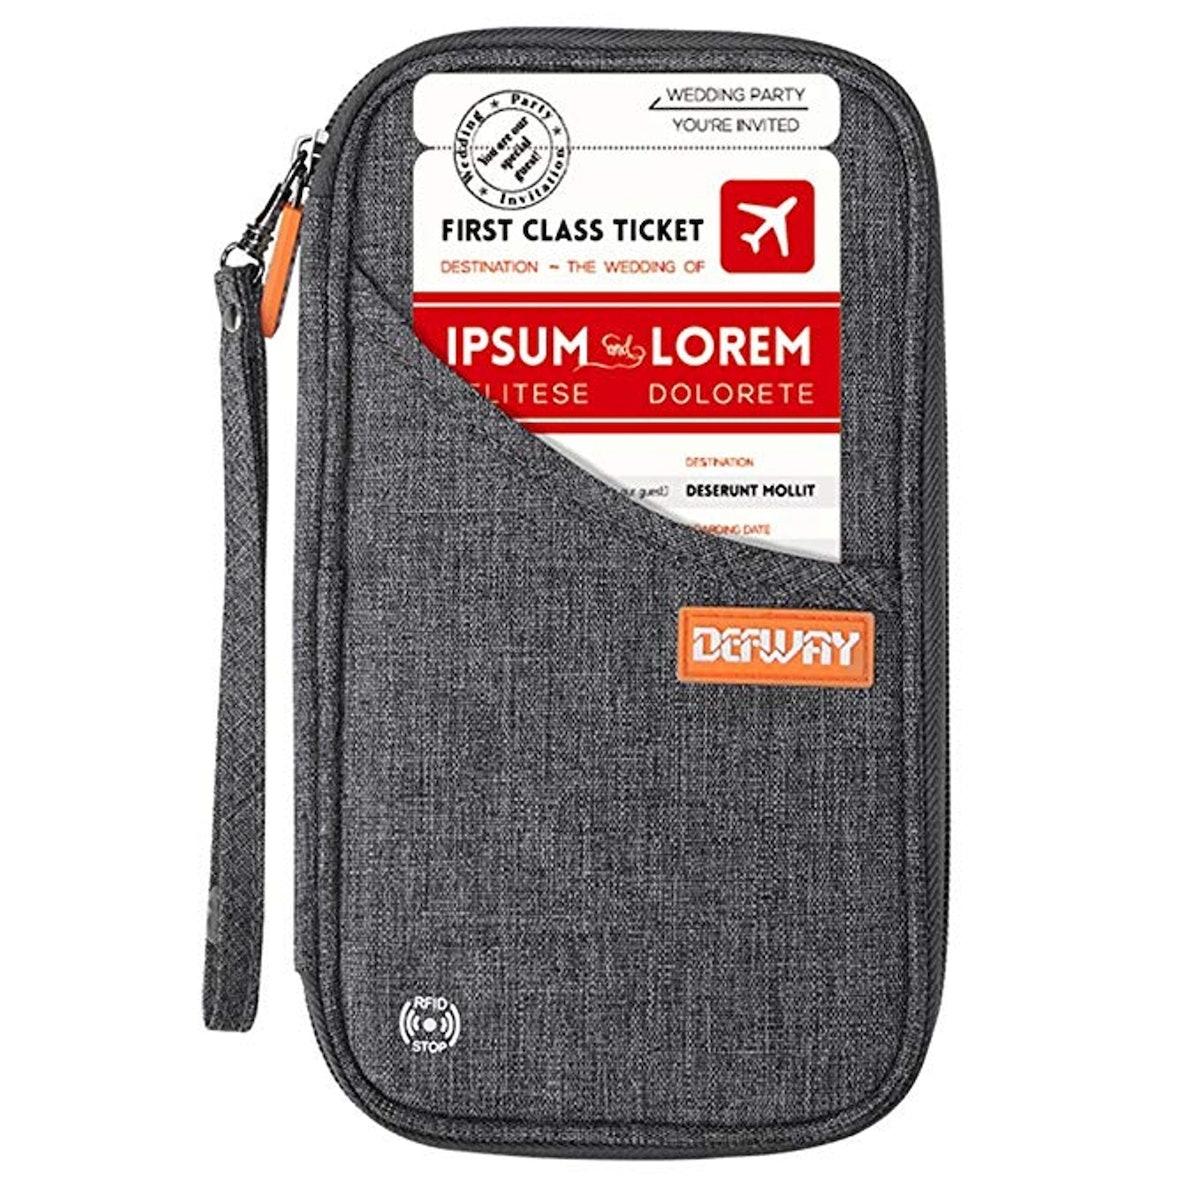 Defway Travel Wallet RFID Blocking Document Organizer Bag